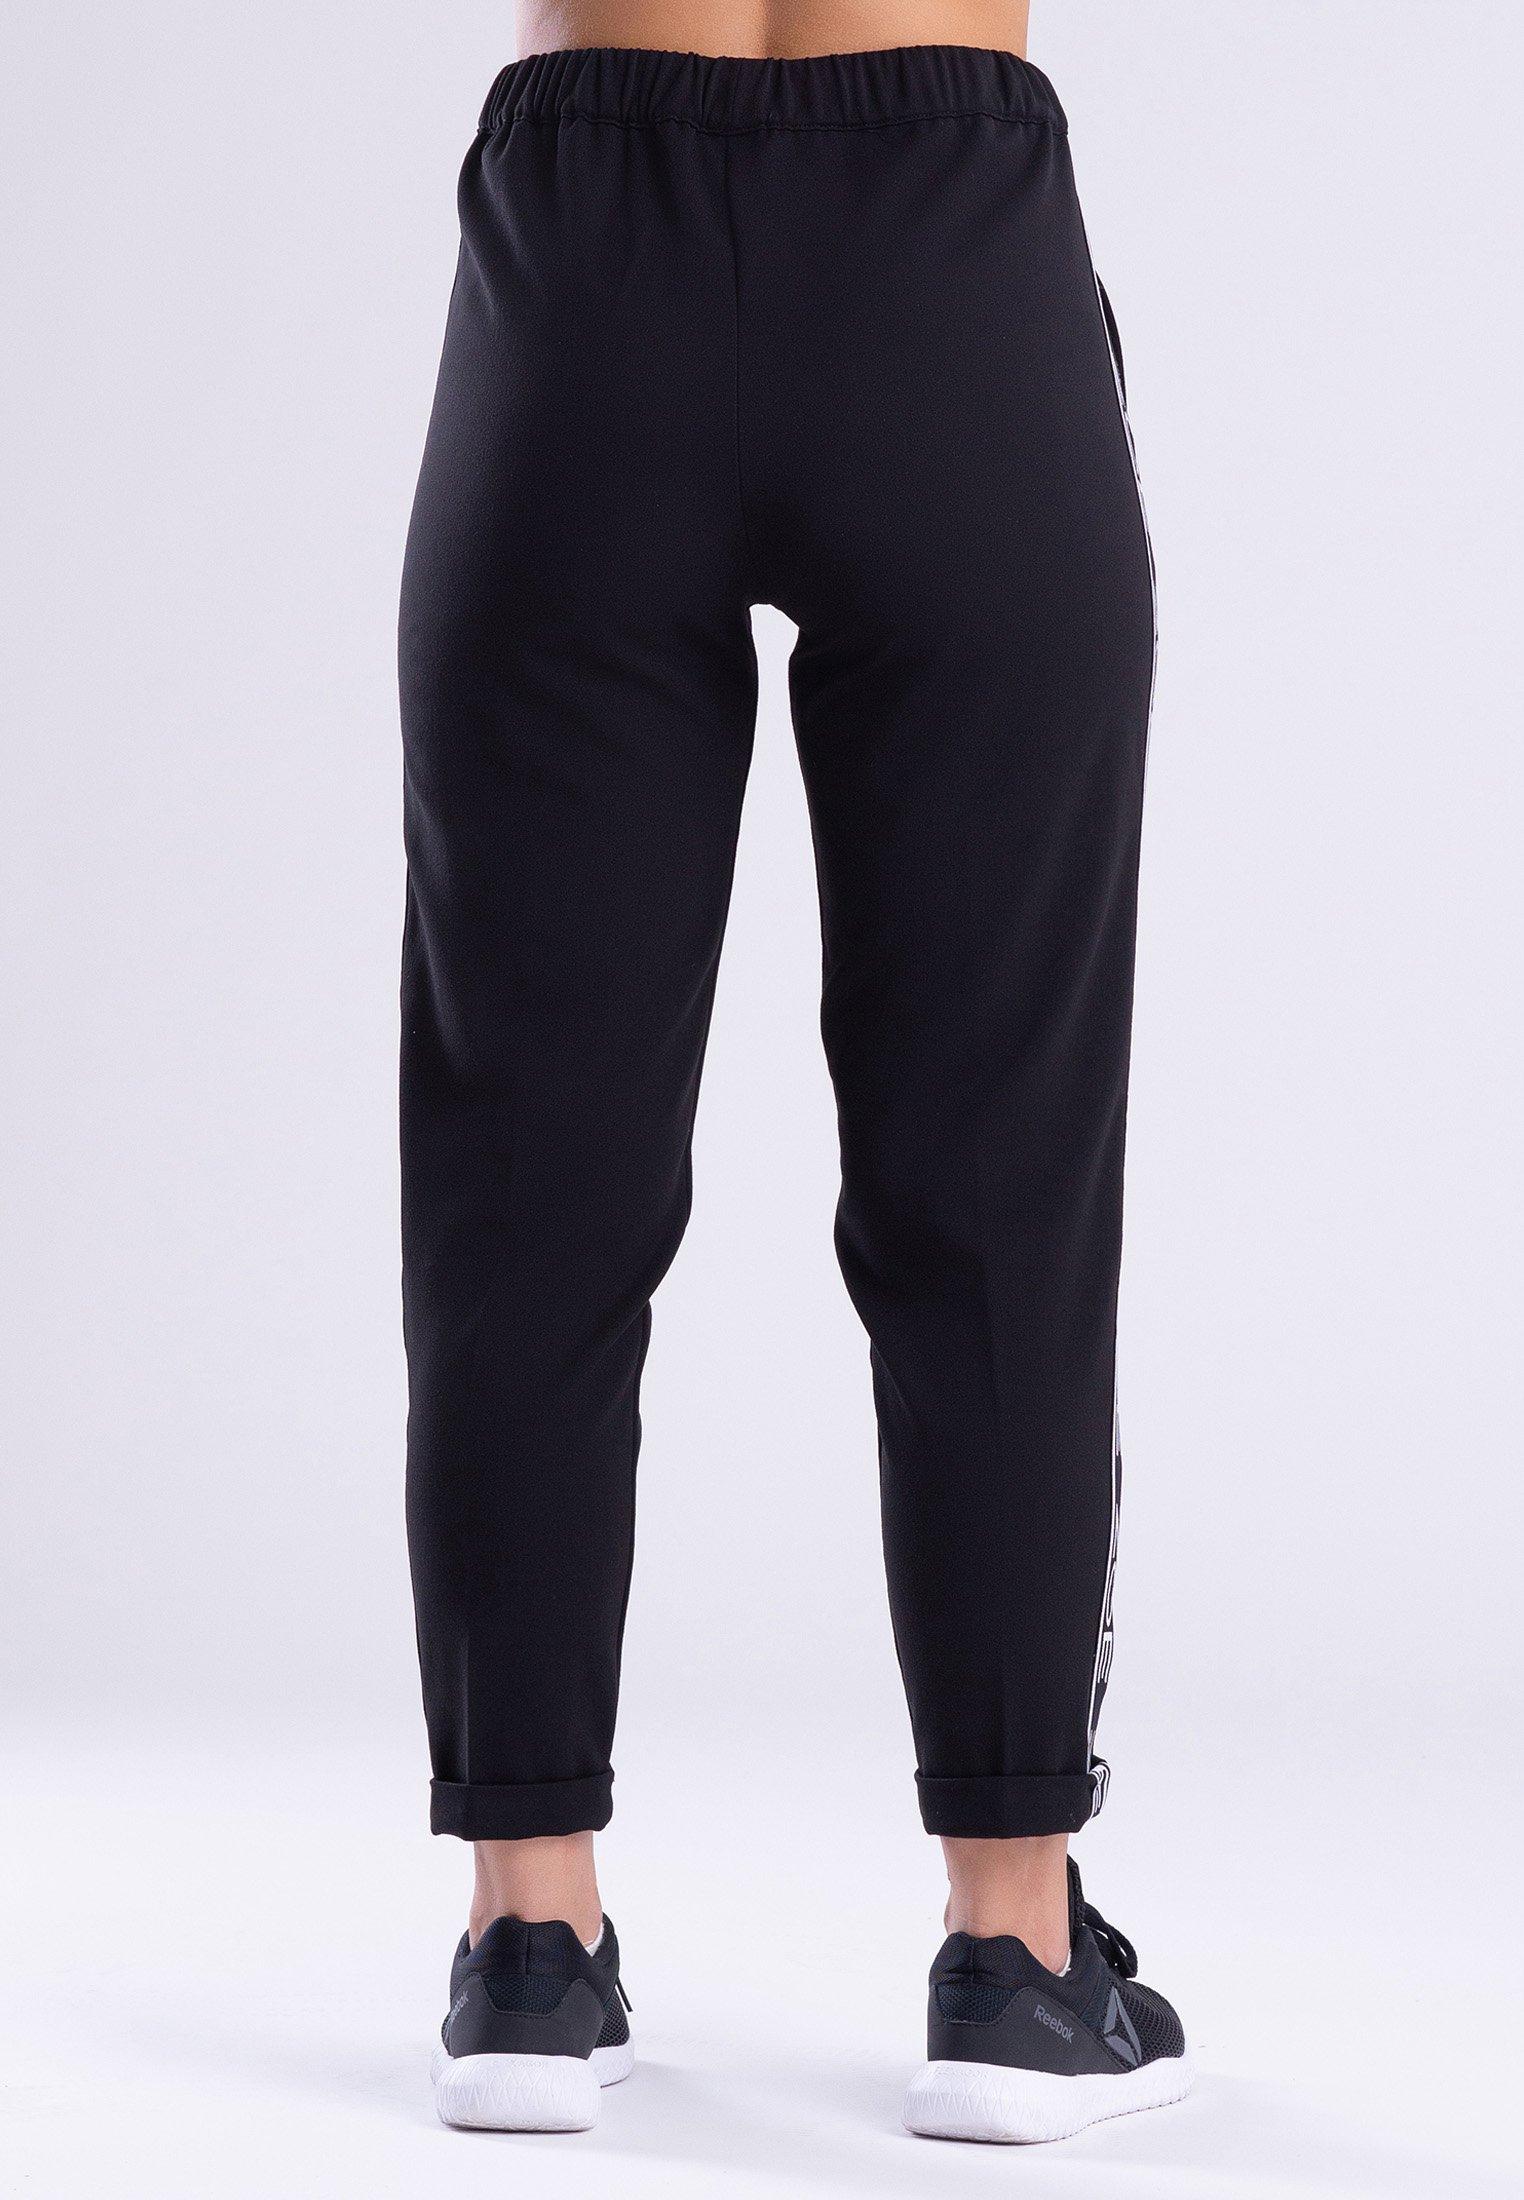 Zoe Leggings Fashion - Tracksuit Bottoms Black